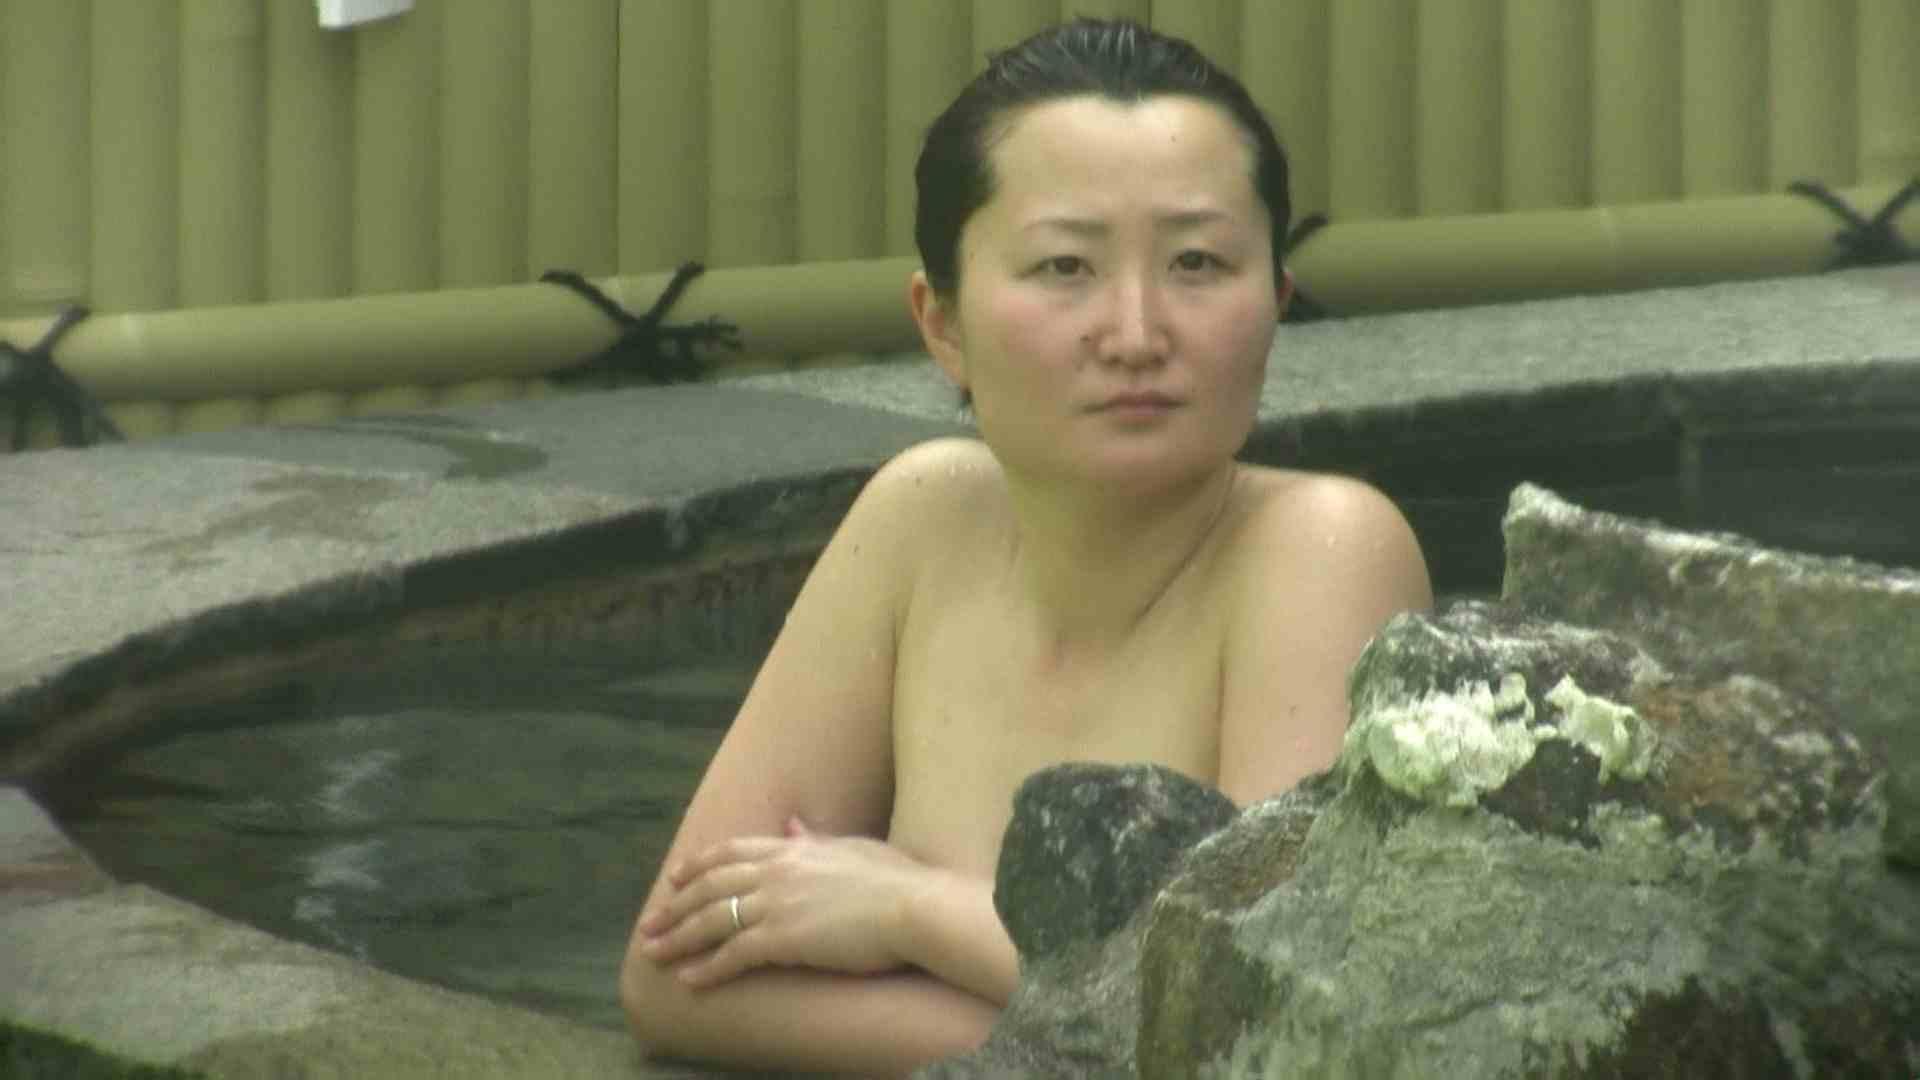 Aquaな露天風呂Vol.632 盗撮シリーズ | 露天風呂編  100PIX 73